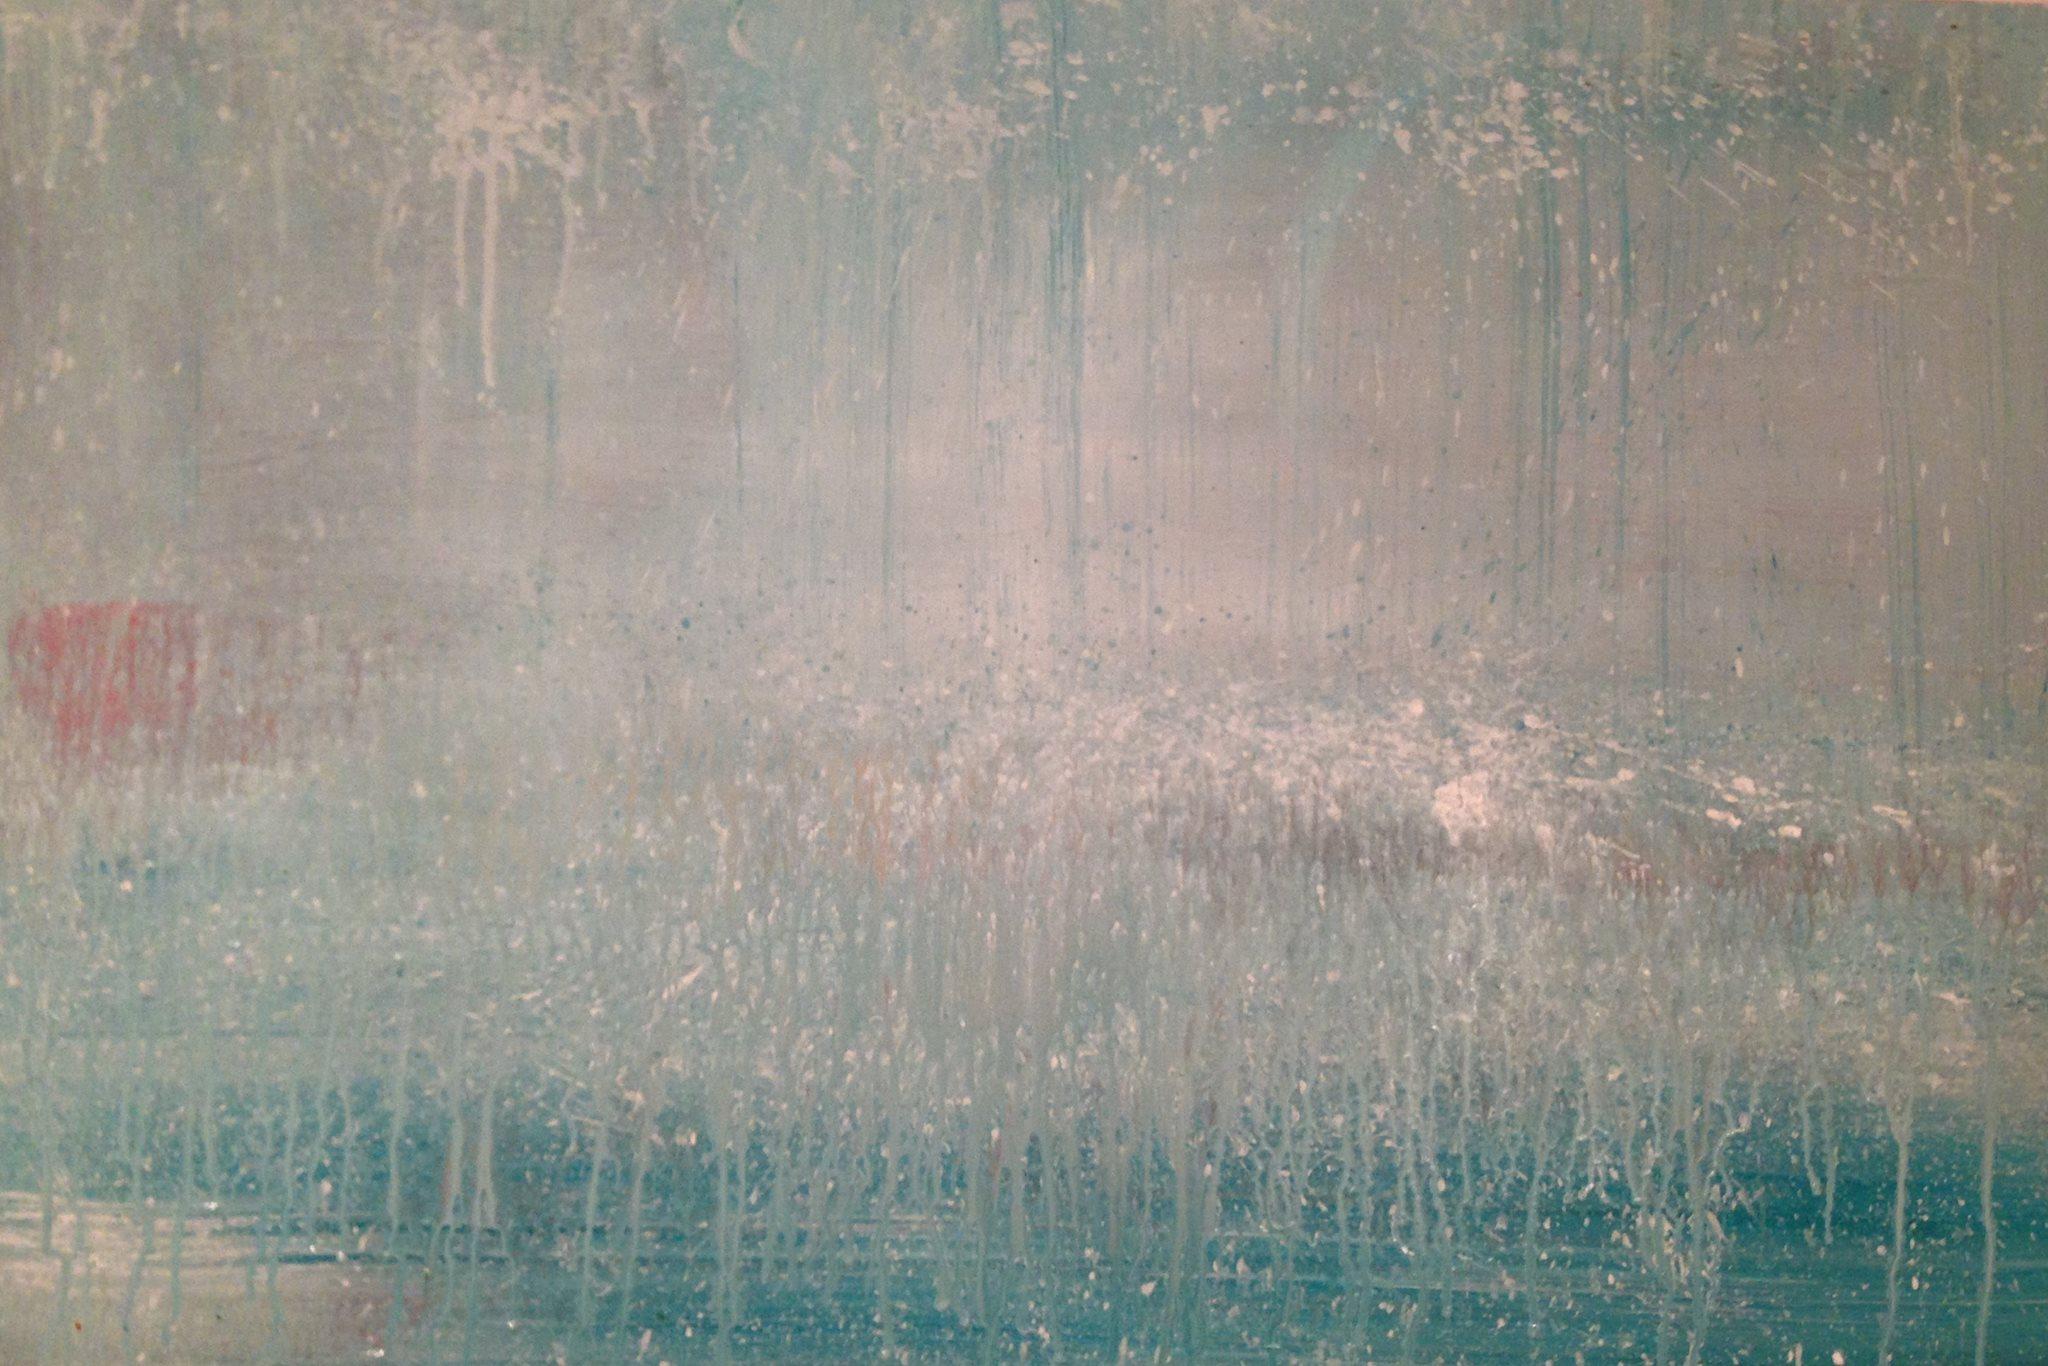 Morning Mist 1 artwork by Cheney Fairchild - art listed for sale on Artplode